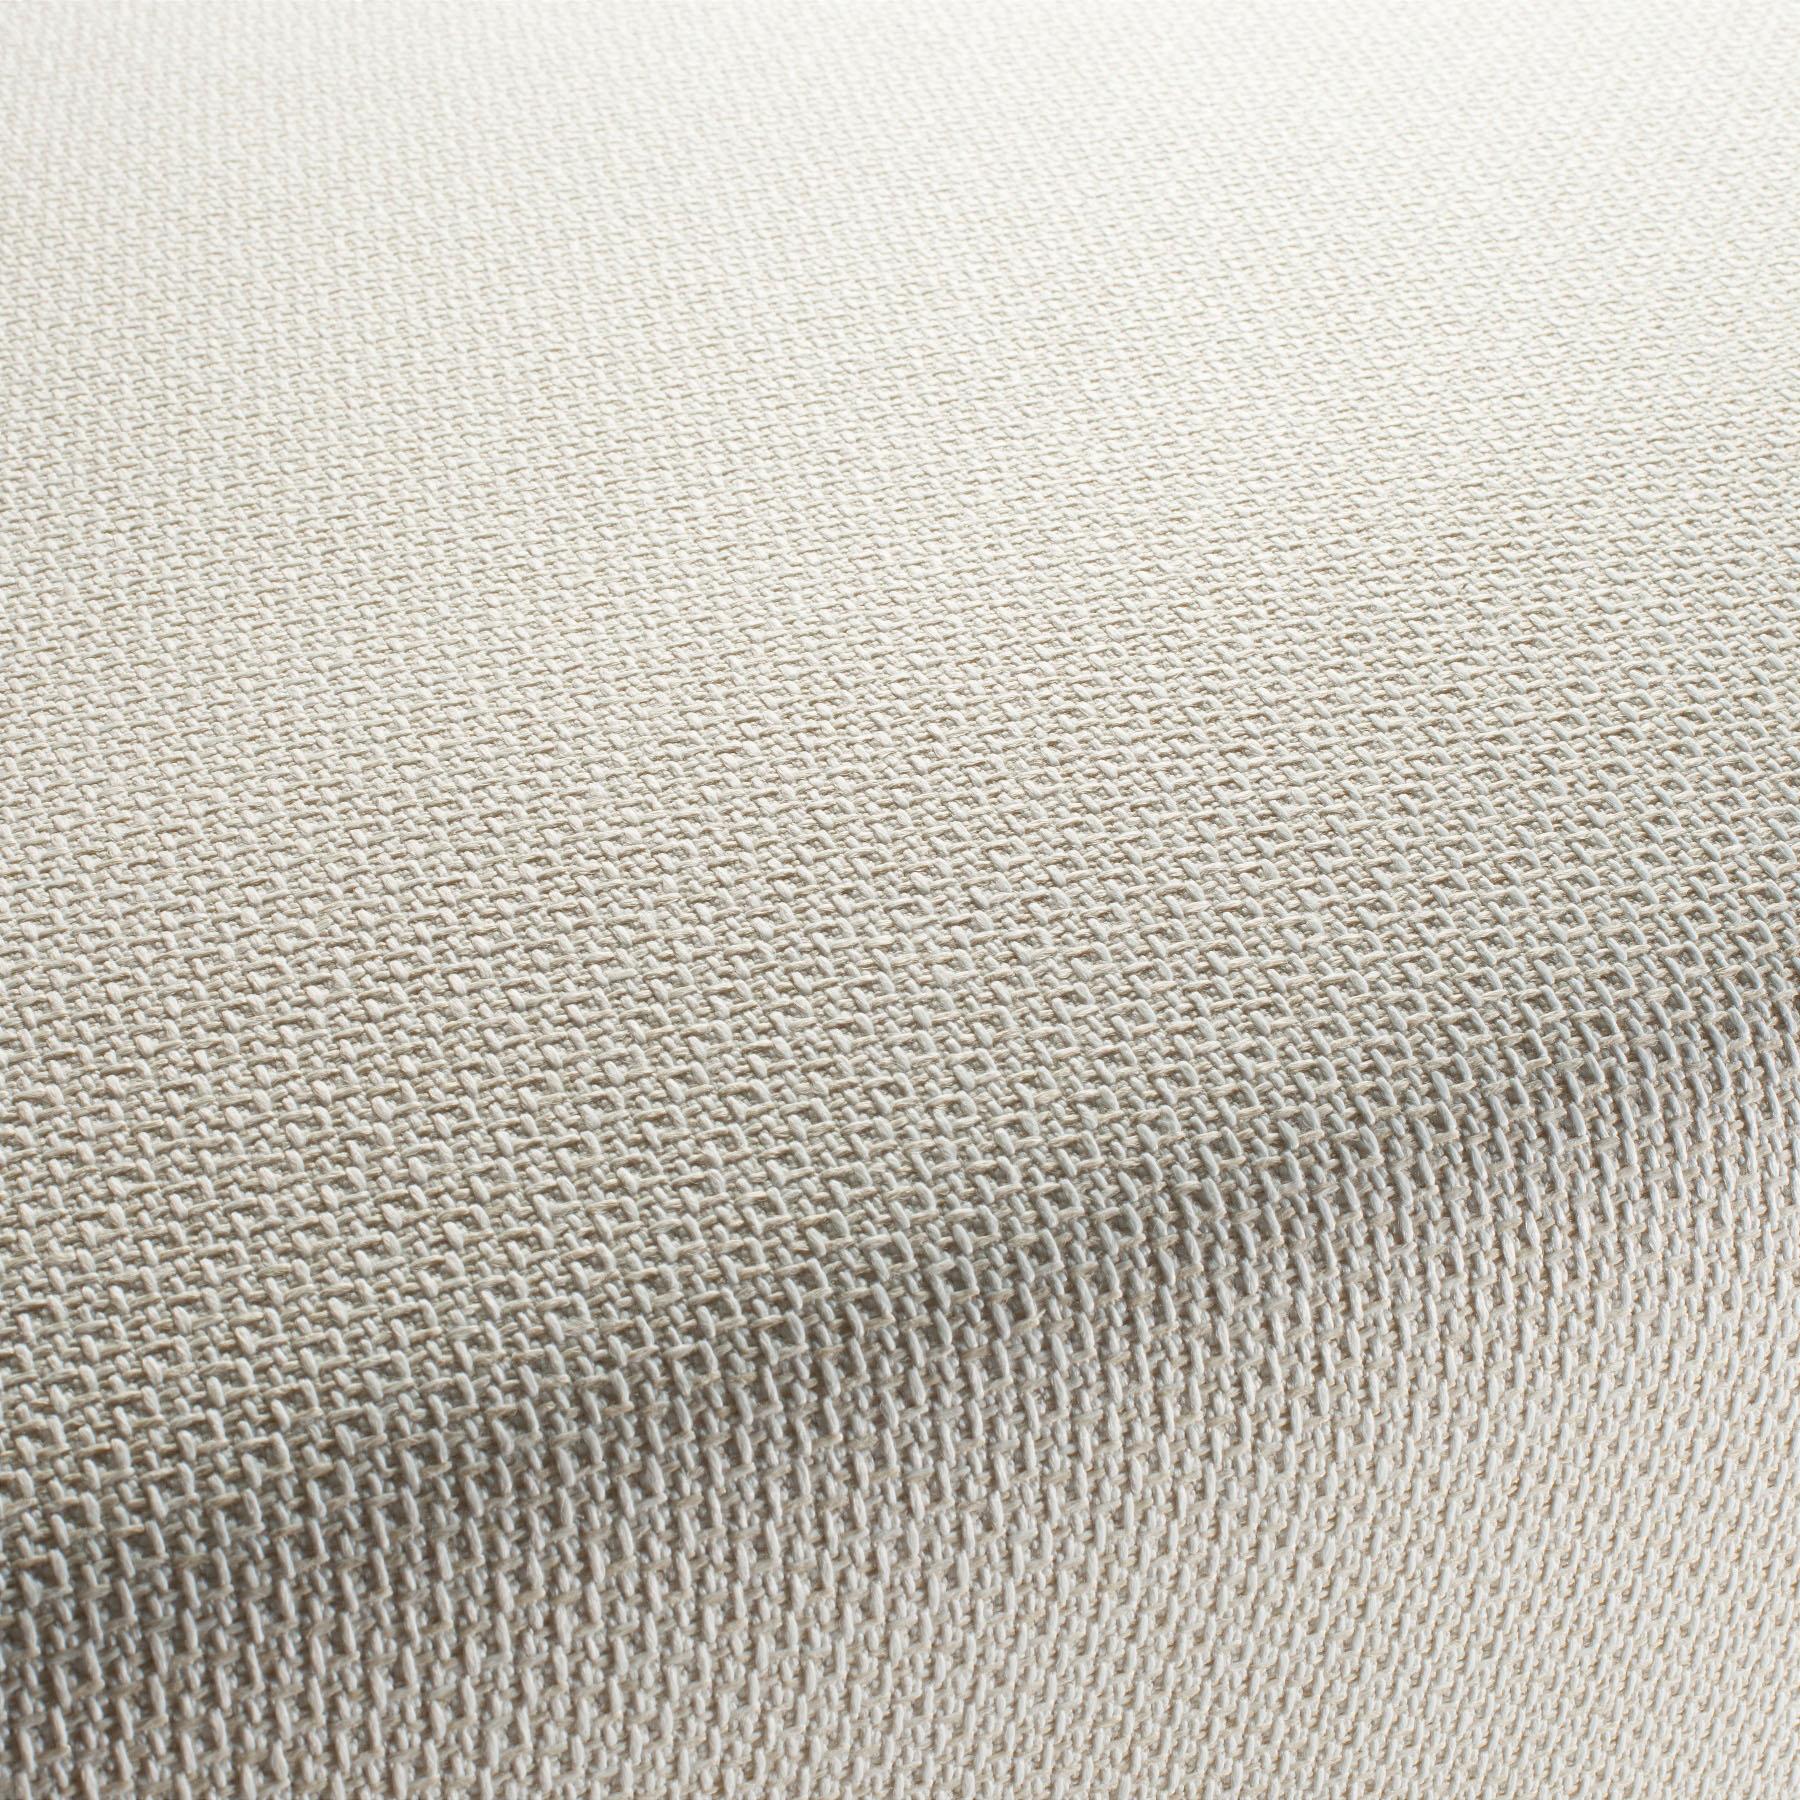 Upholstery Fabric Shore 9 2062 070 Jab Anstoetz Fabrics